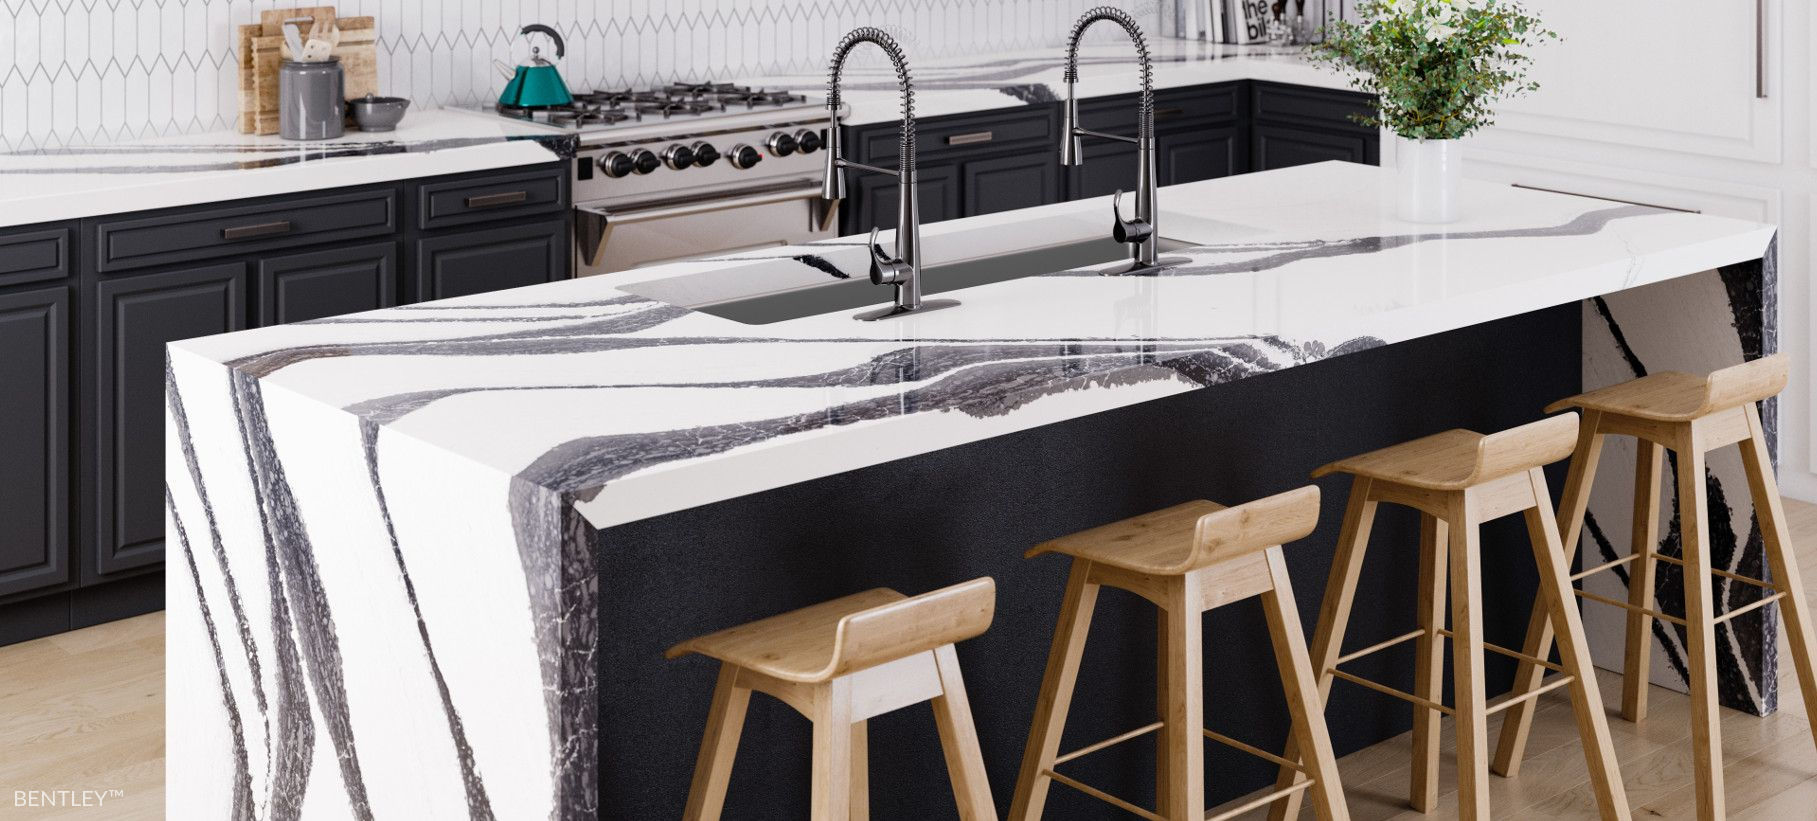 Cambria-Bentley-kitchen